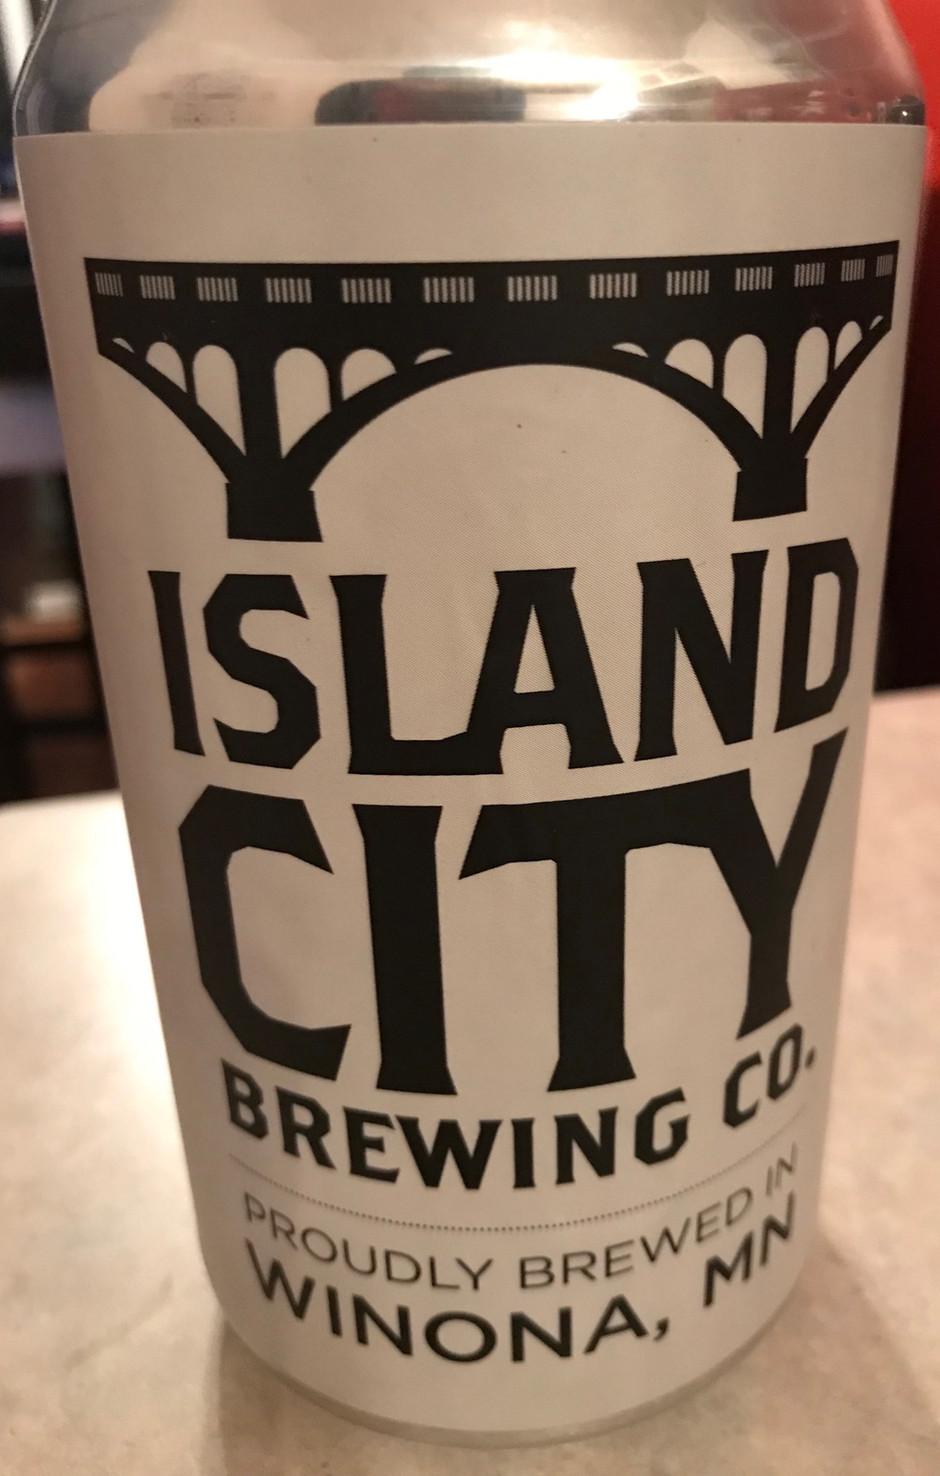 Island City Docksider